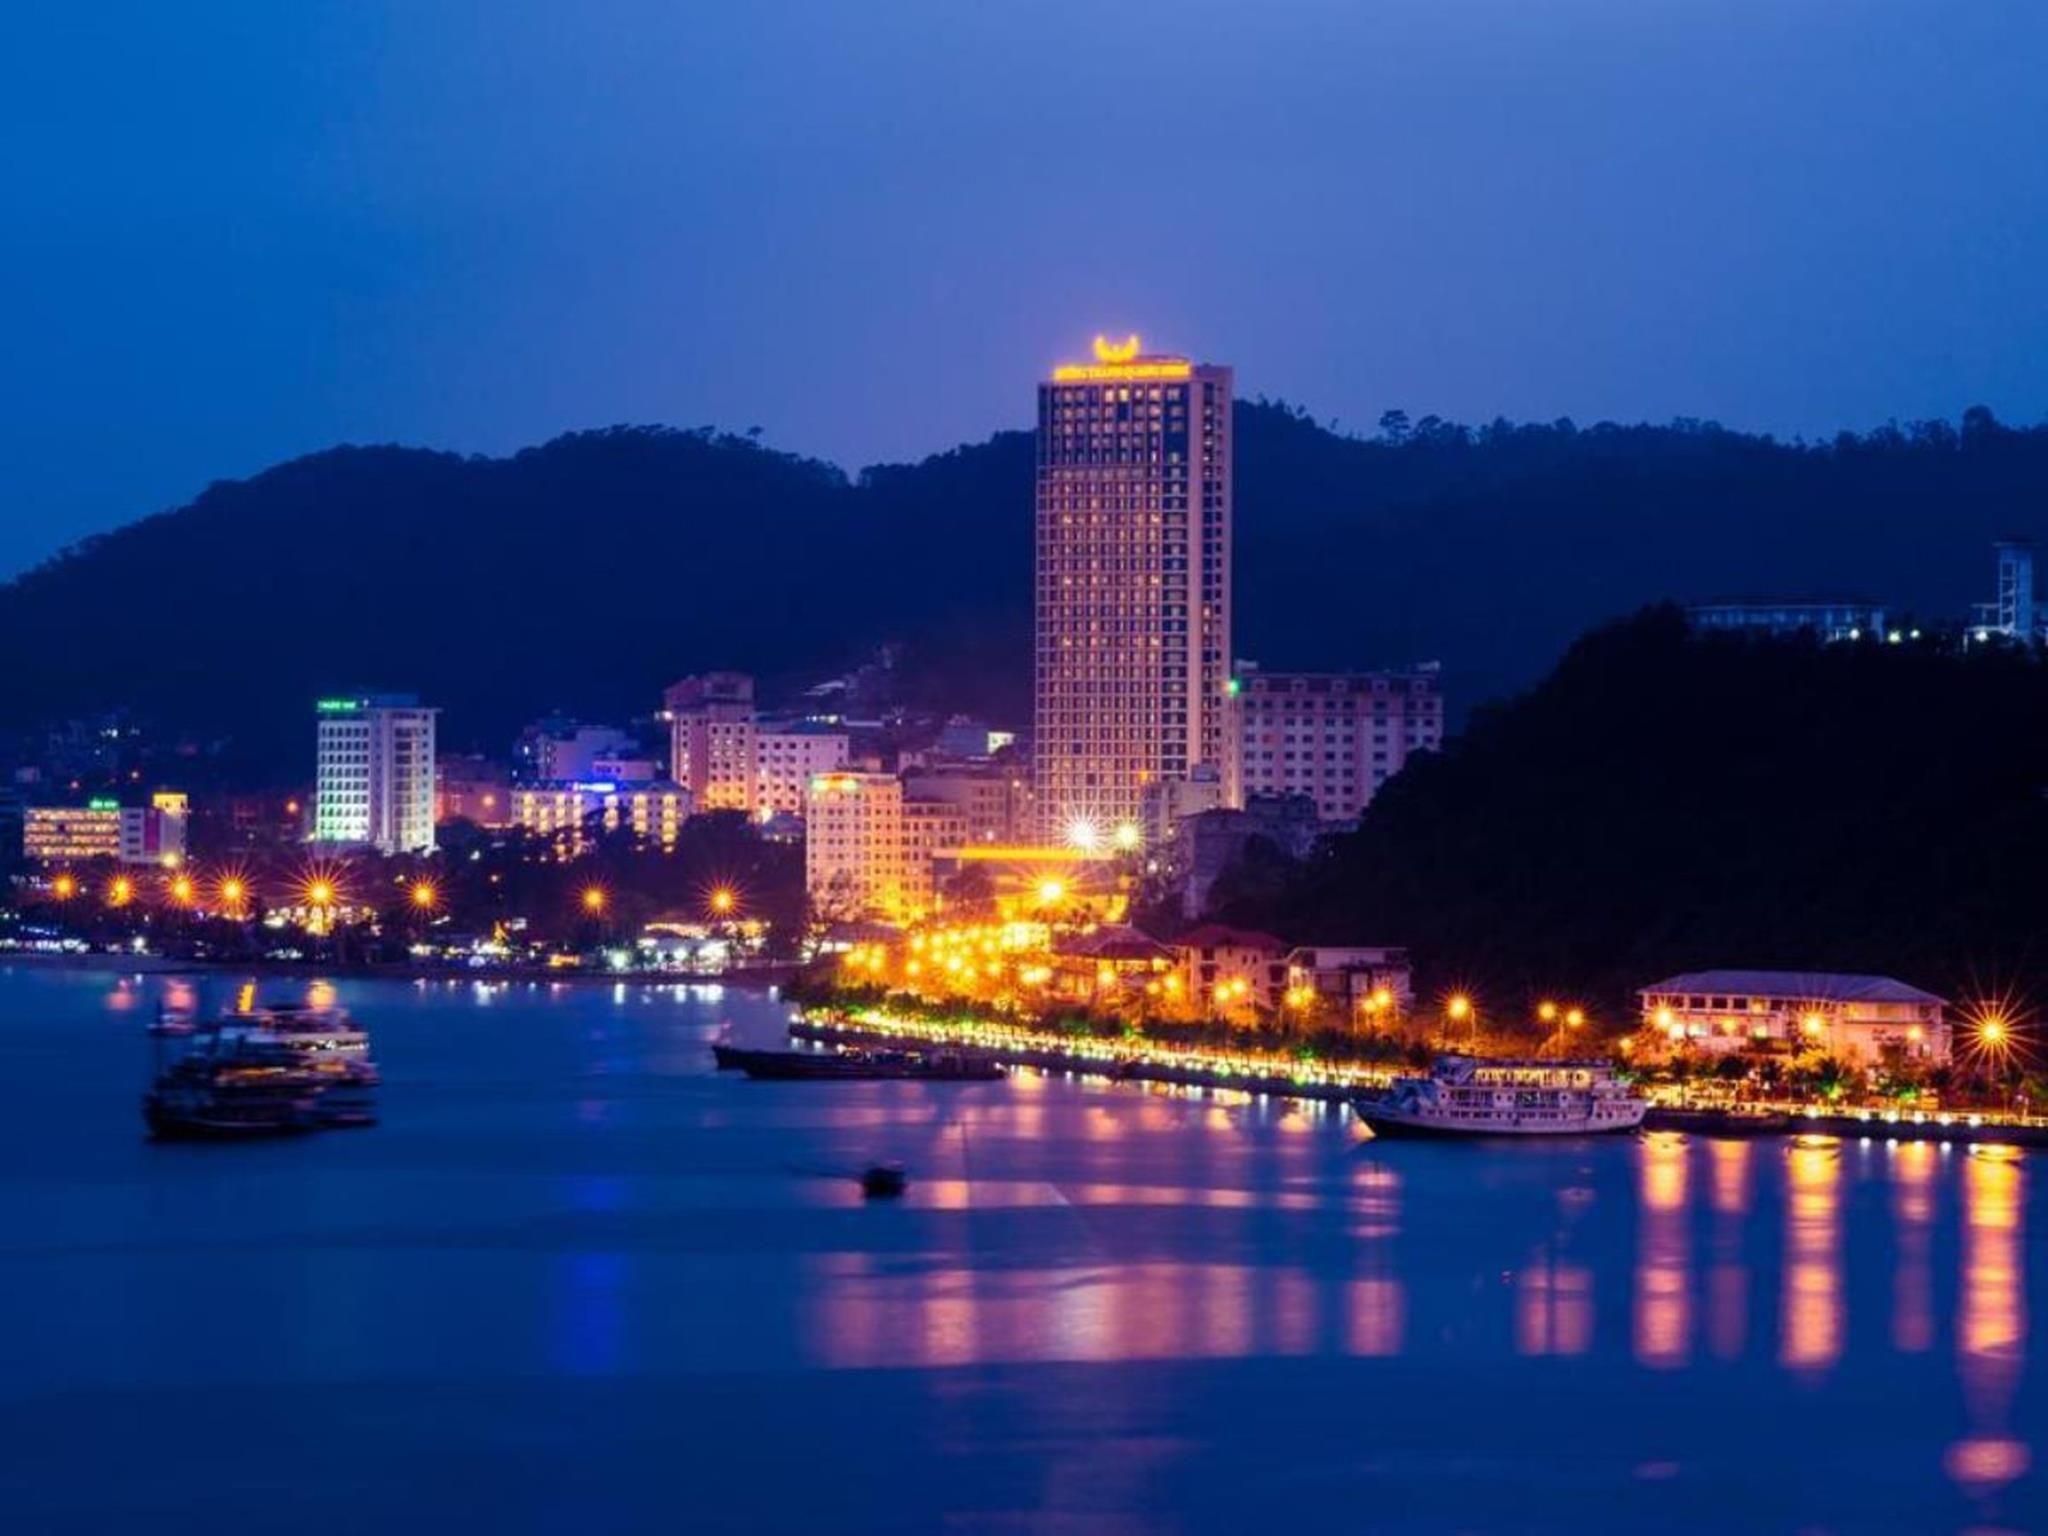 Halong muong thanh luxury quang ninh hotel vietnam asia